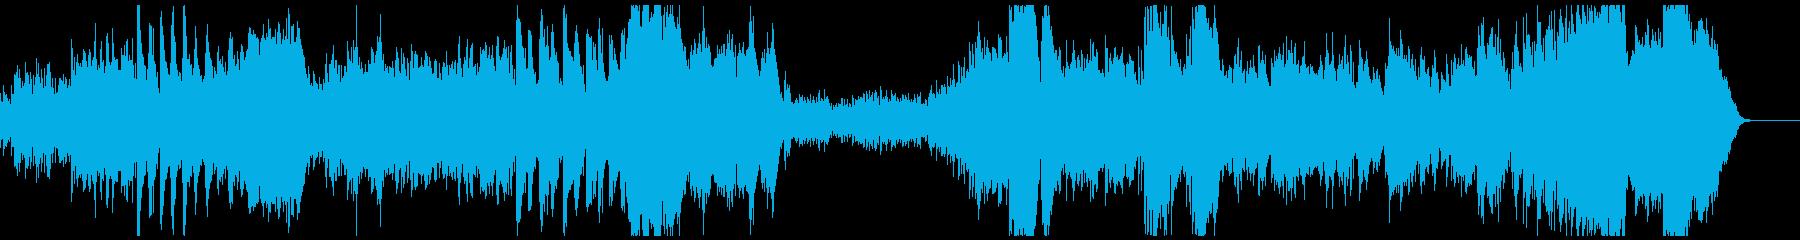 RV565_3『アレグロ』ヴィヴァルディの再生済みの波形